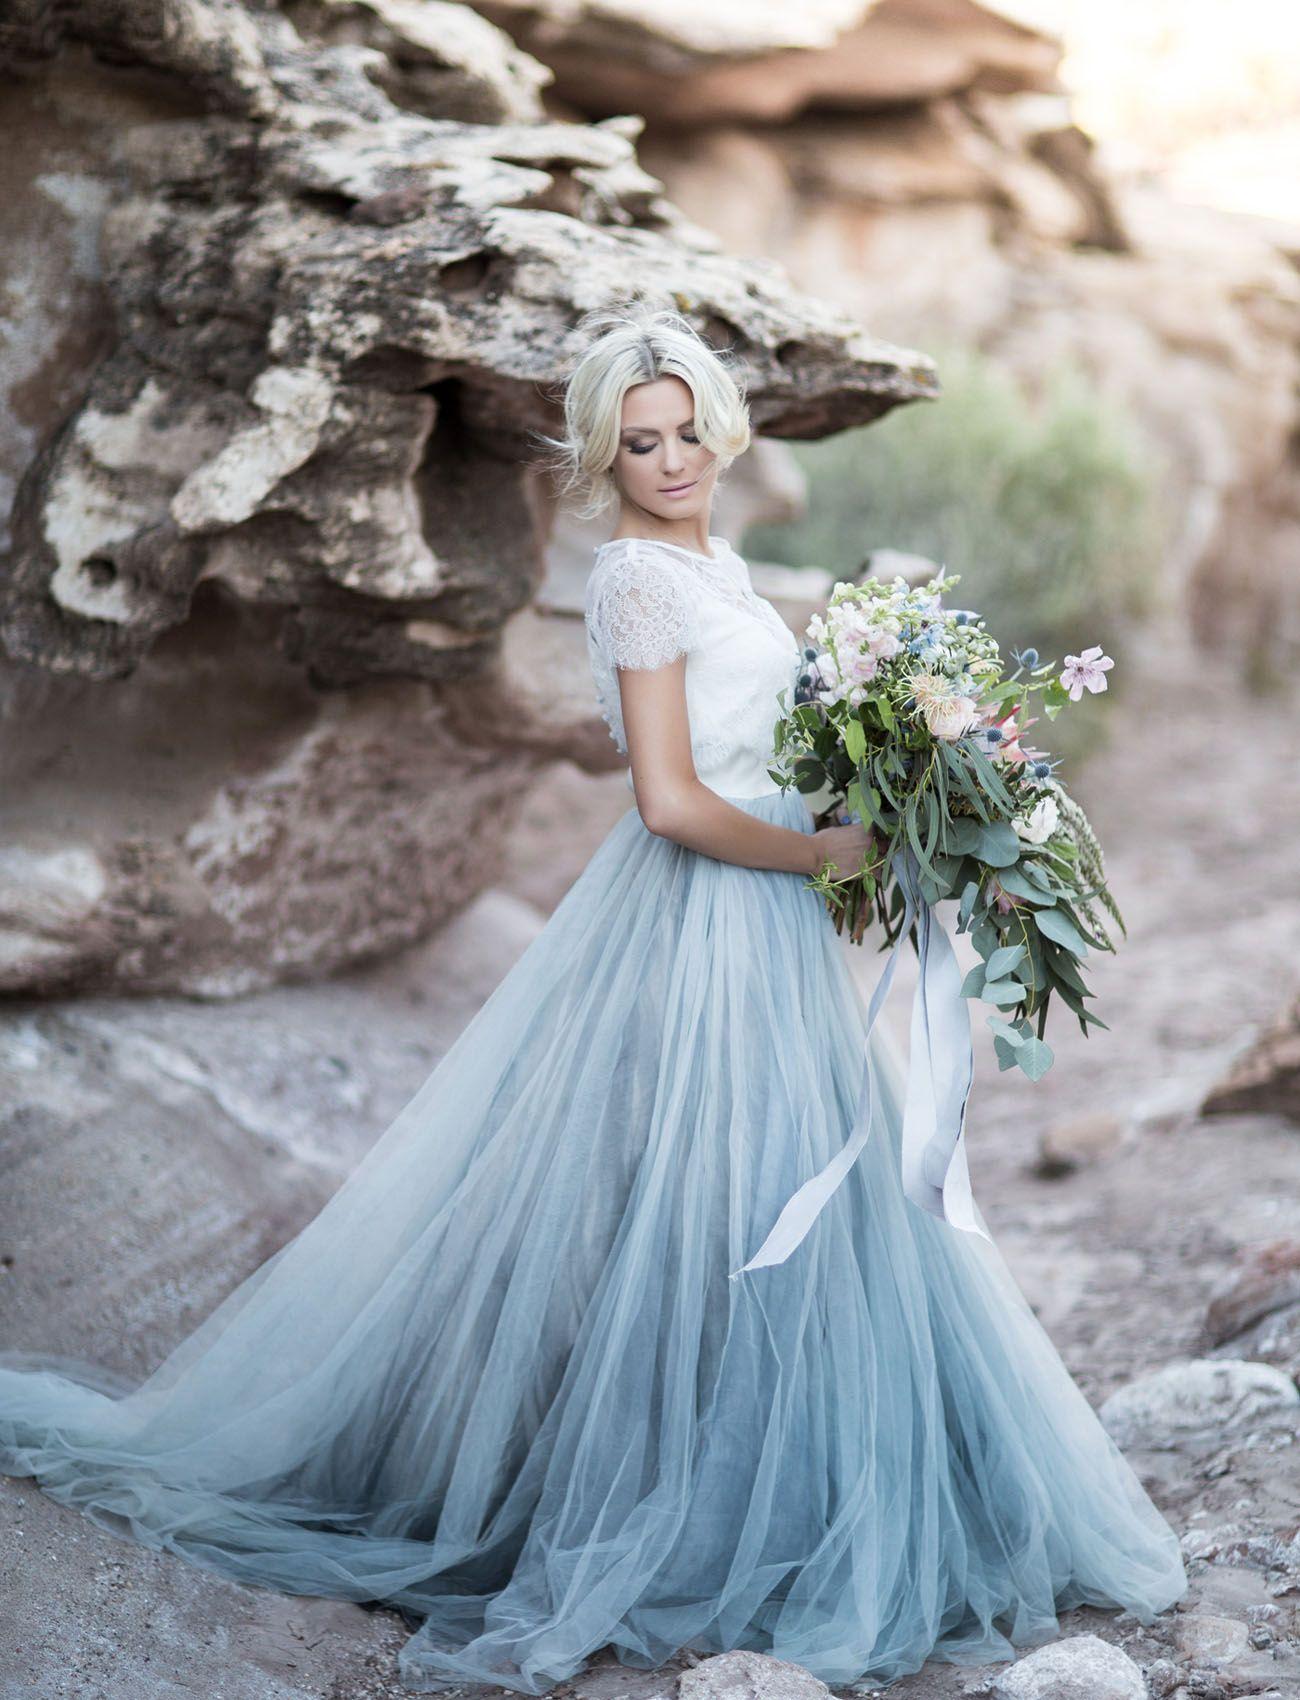 Desert Wedding Inspiration at Zion National Park dream wedding